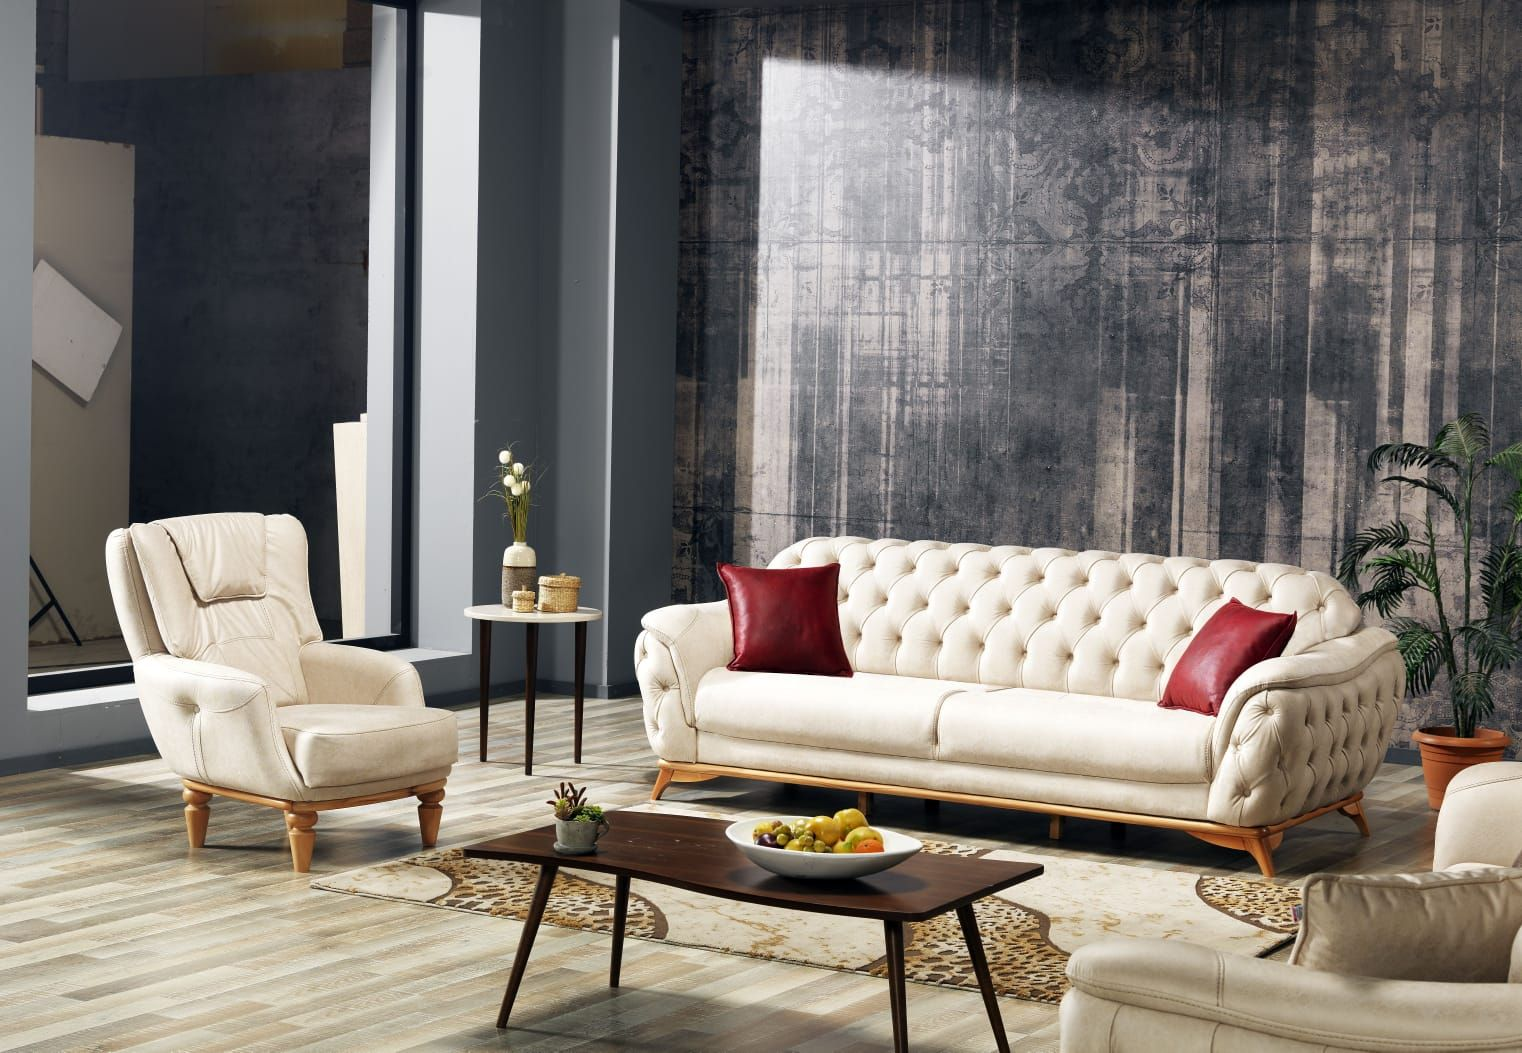 Pin By Zeki Deniz On Koltuk Modelleri 2019 Sofa Furniture Furniture Design Luxury Sofa